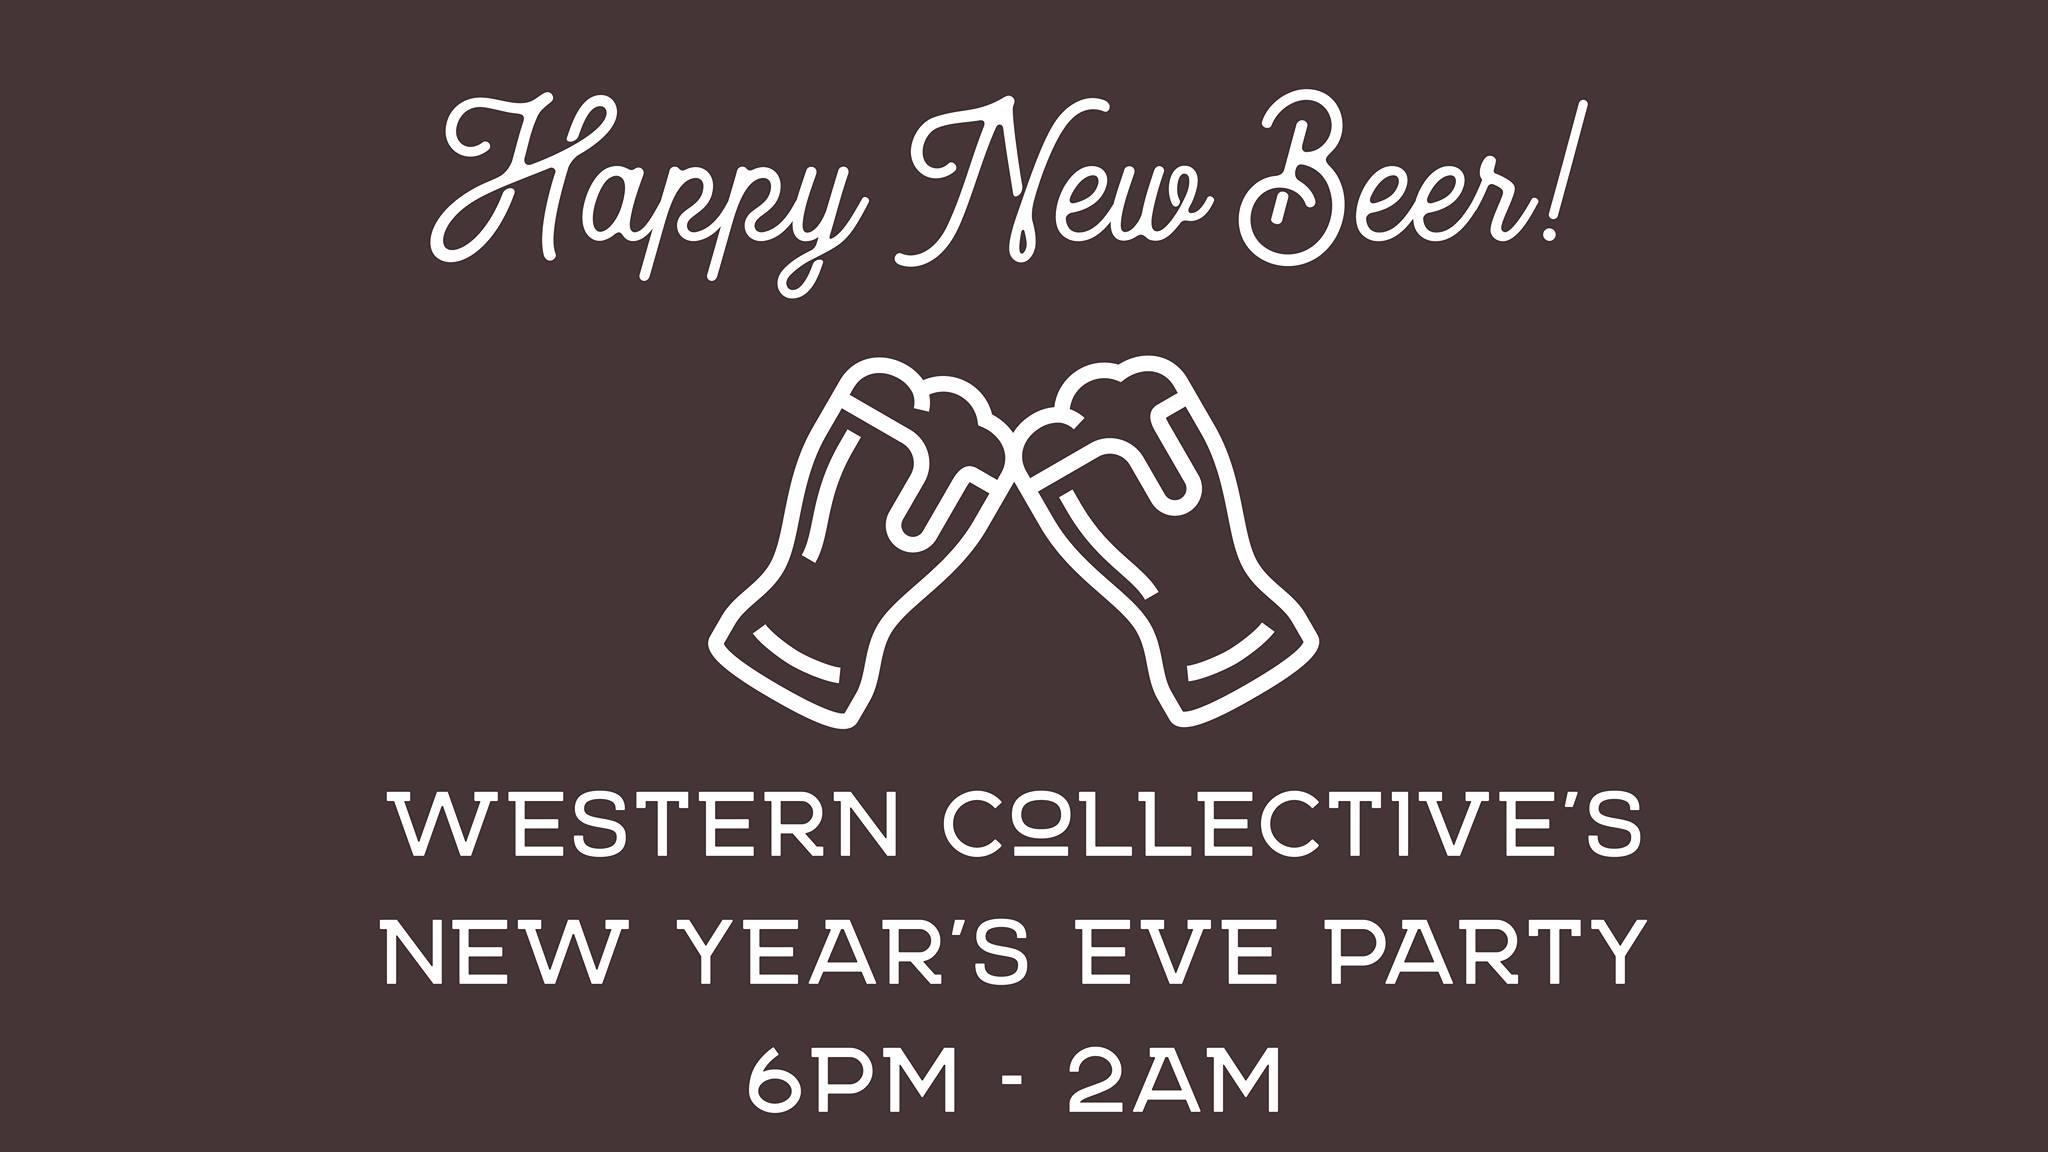 Source: Western Collective Beer